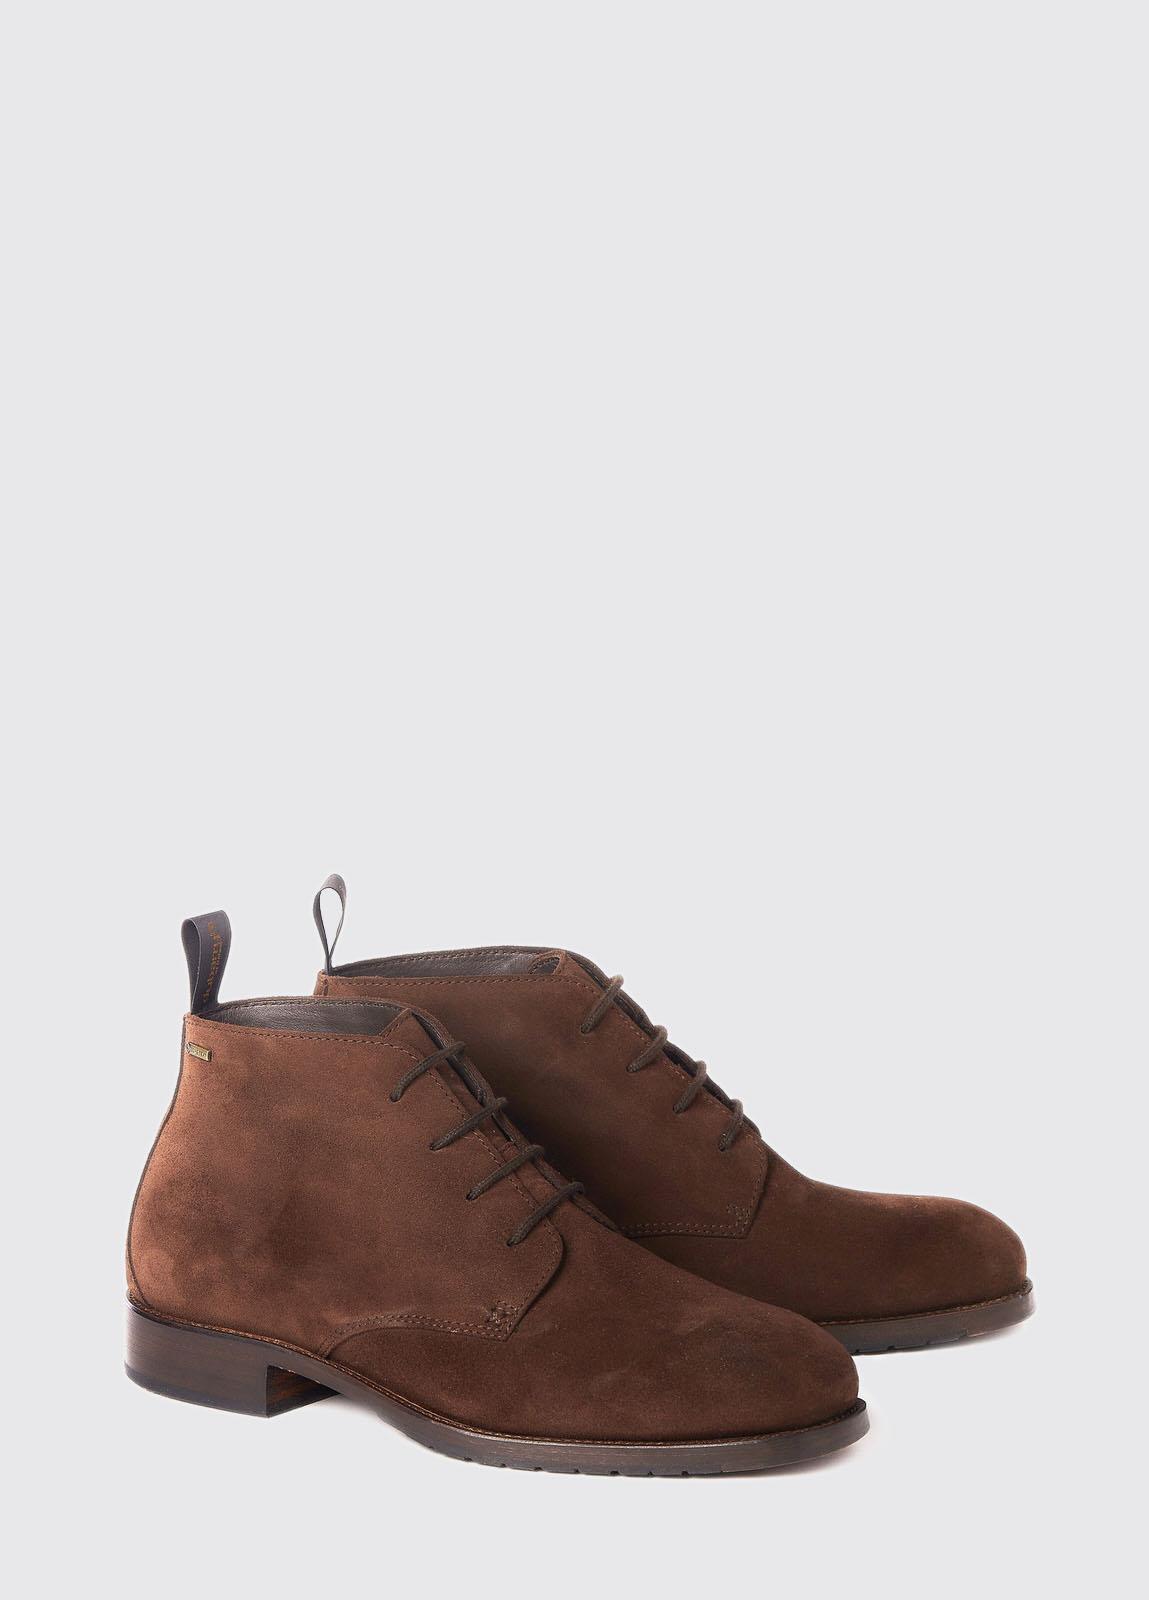 Kilgarvan Lace-up Boot - Cigar